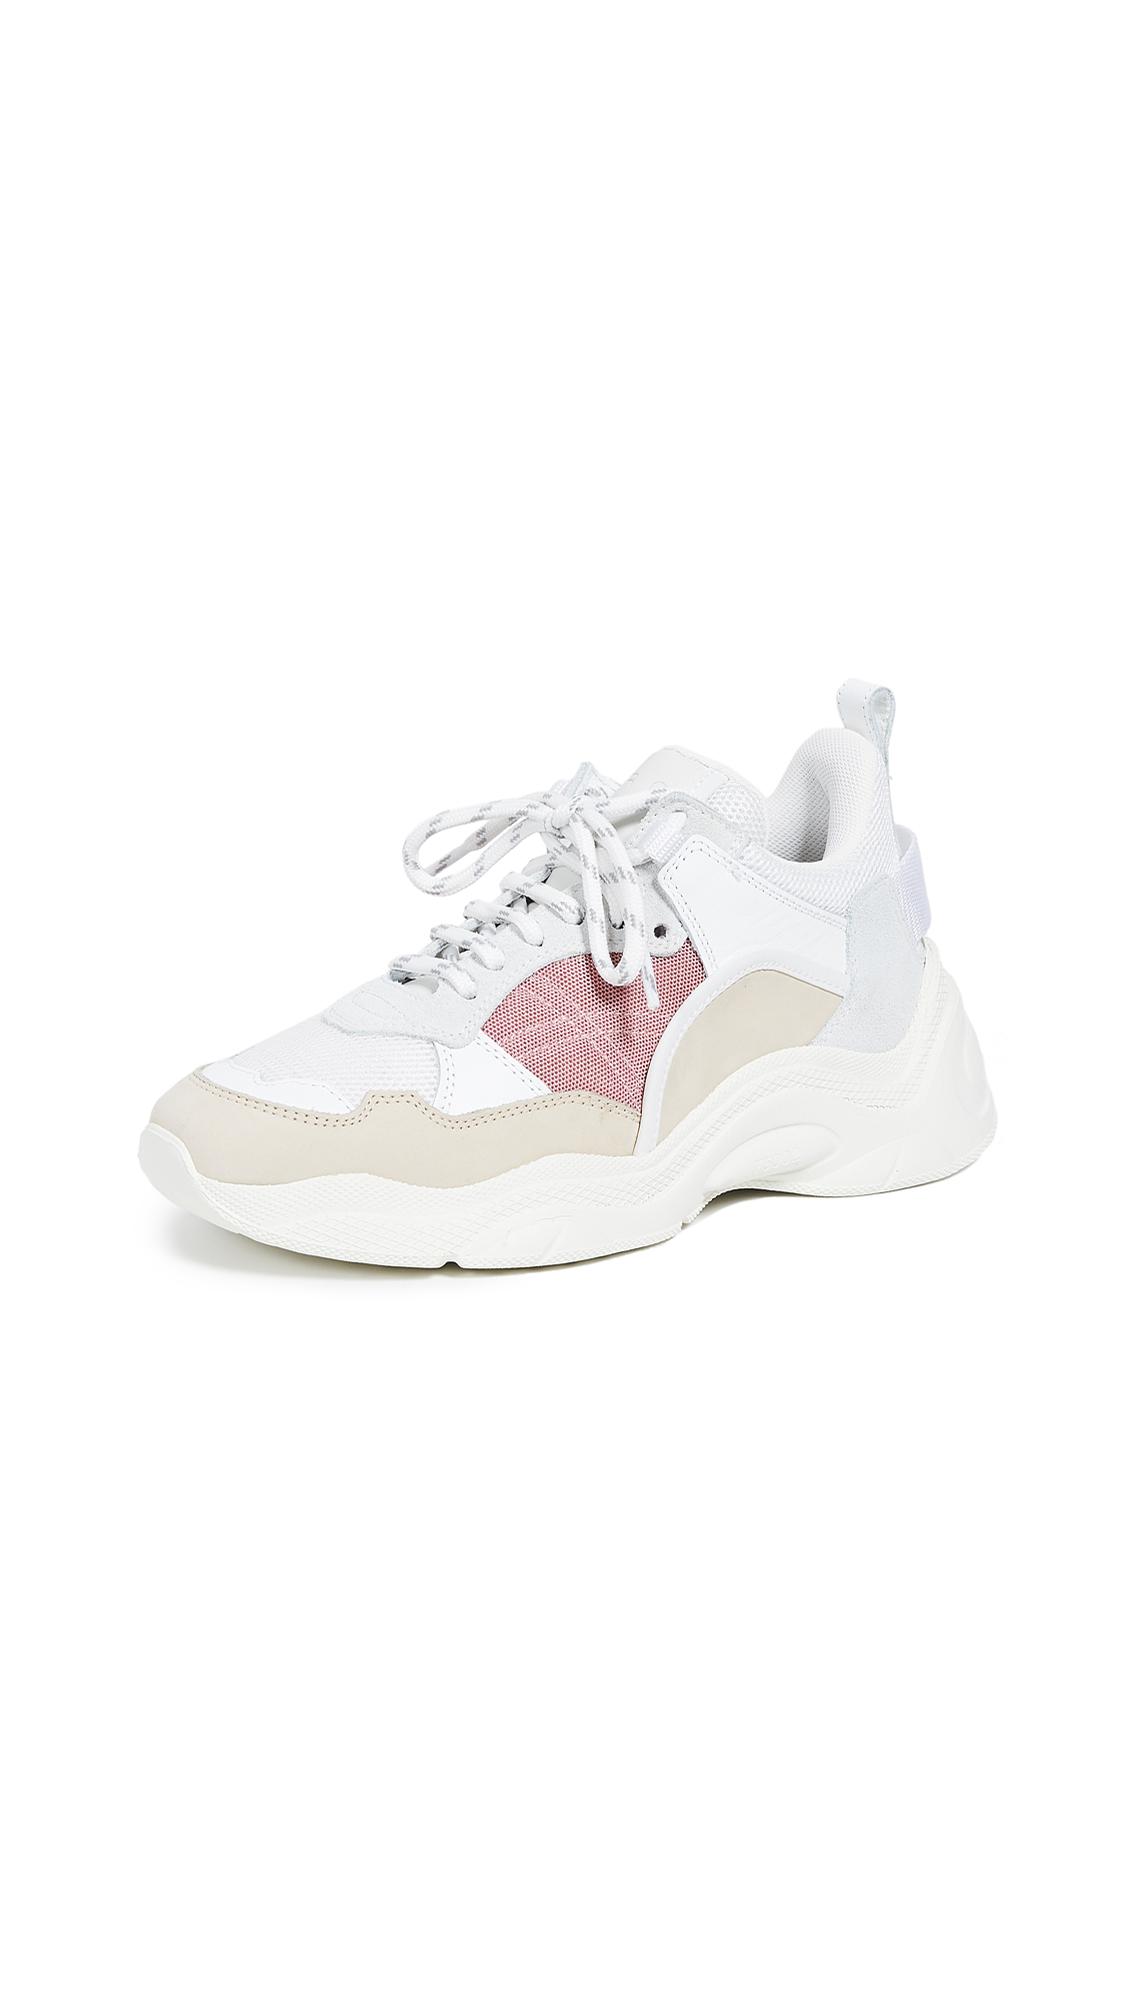 IRO Curverunner Sneakers - Pink